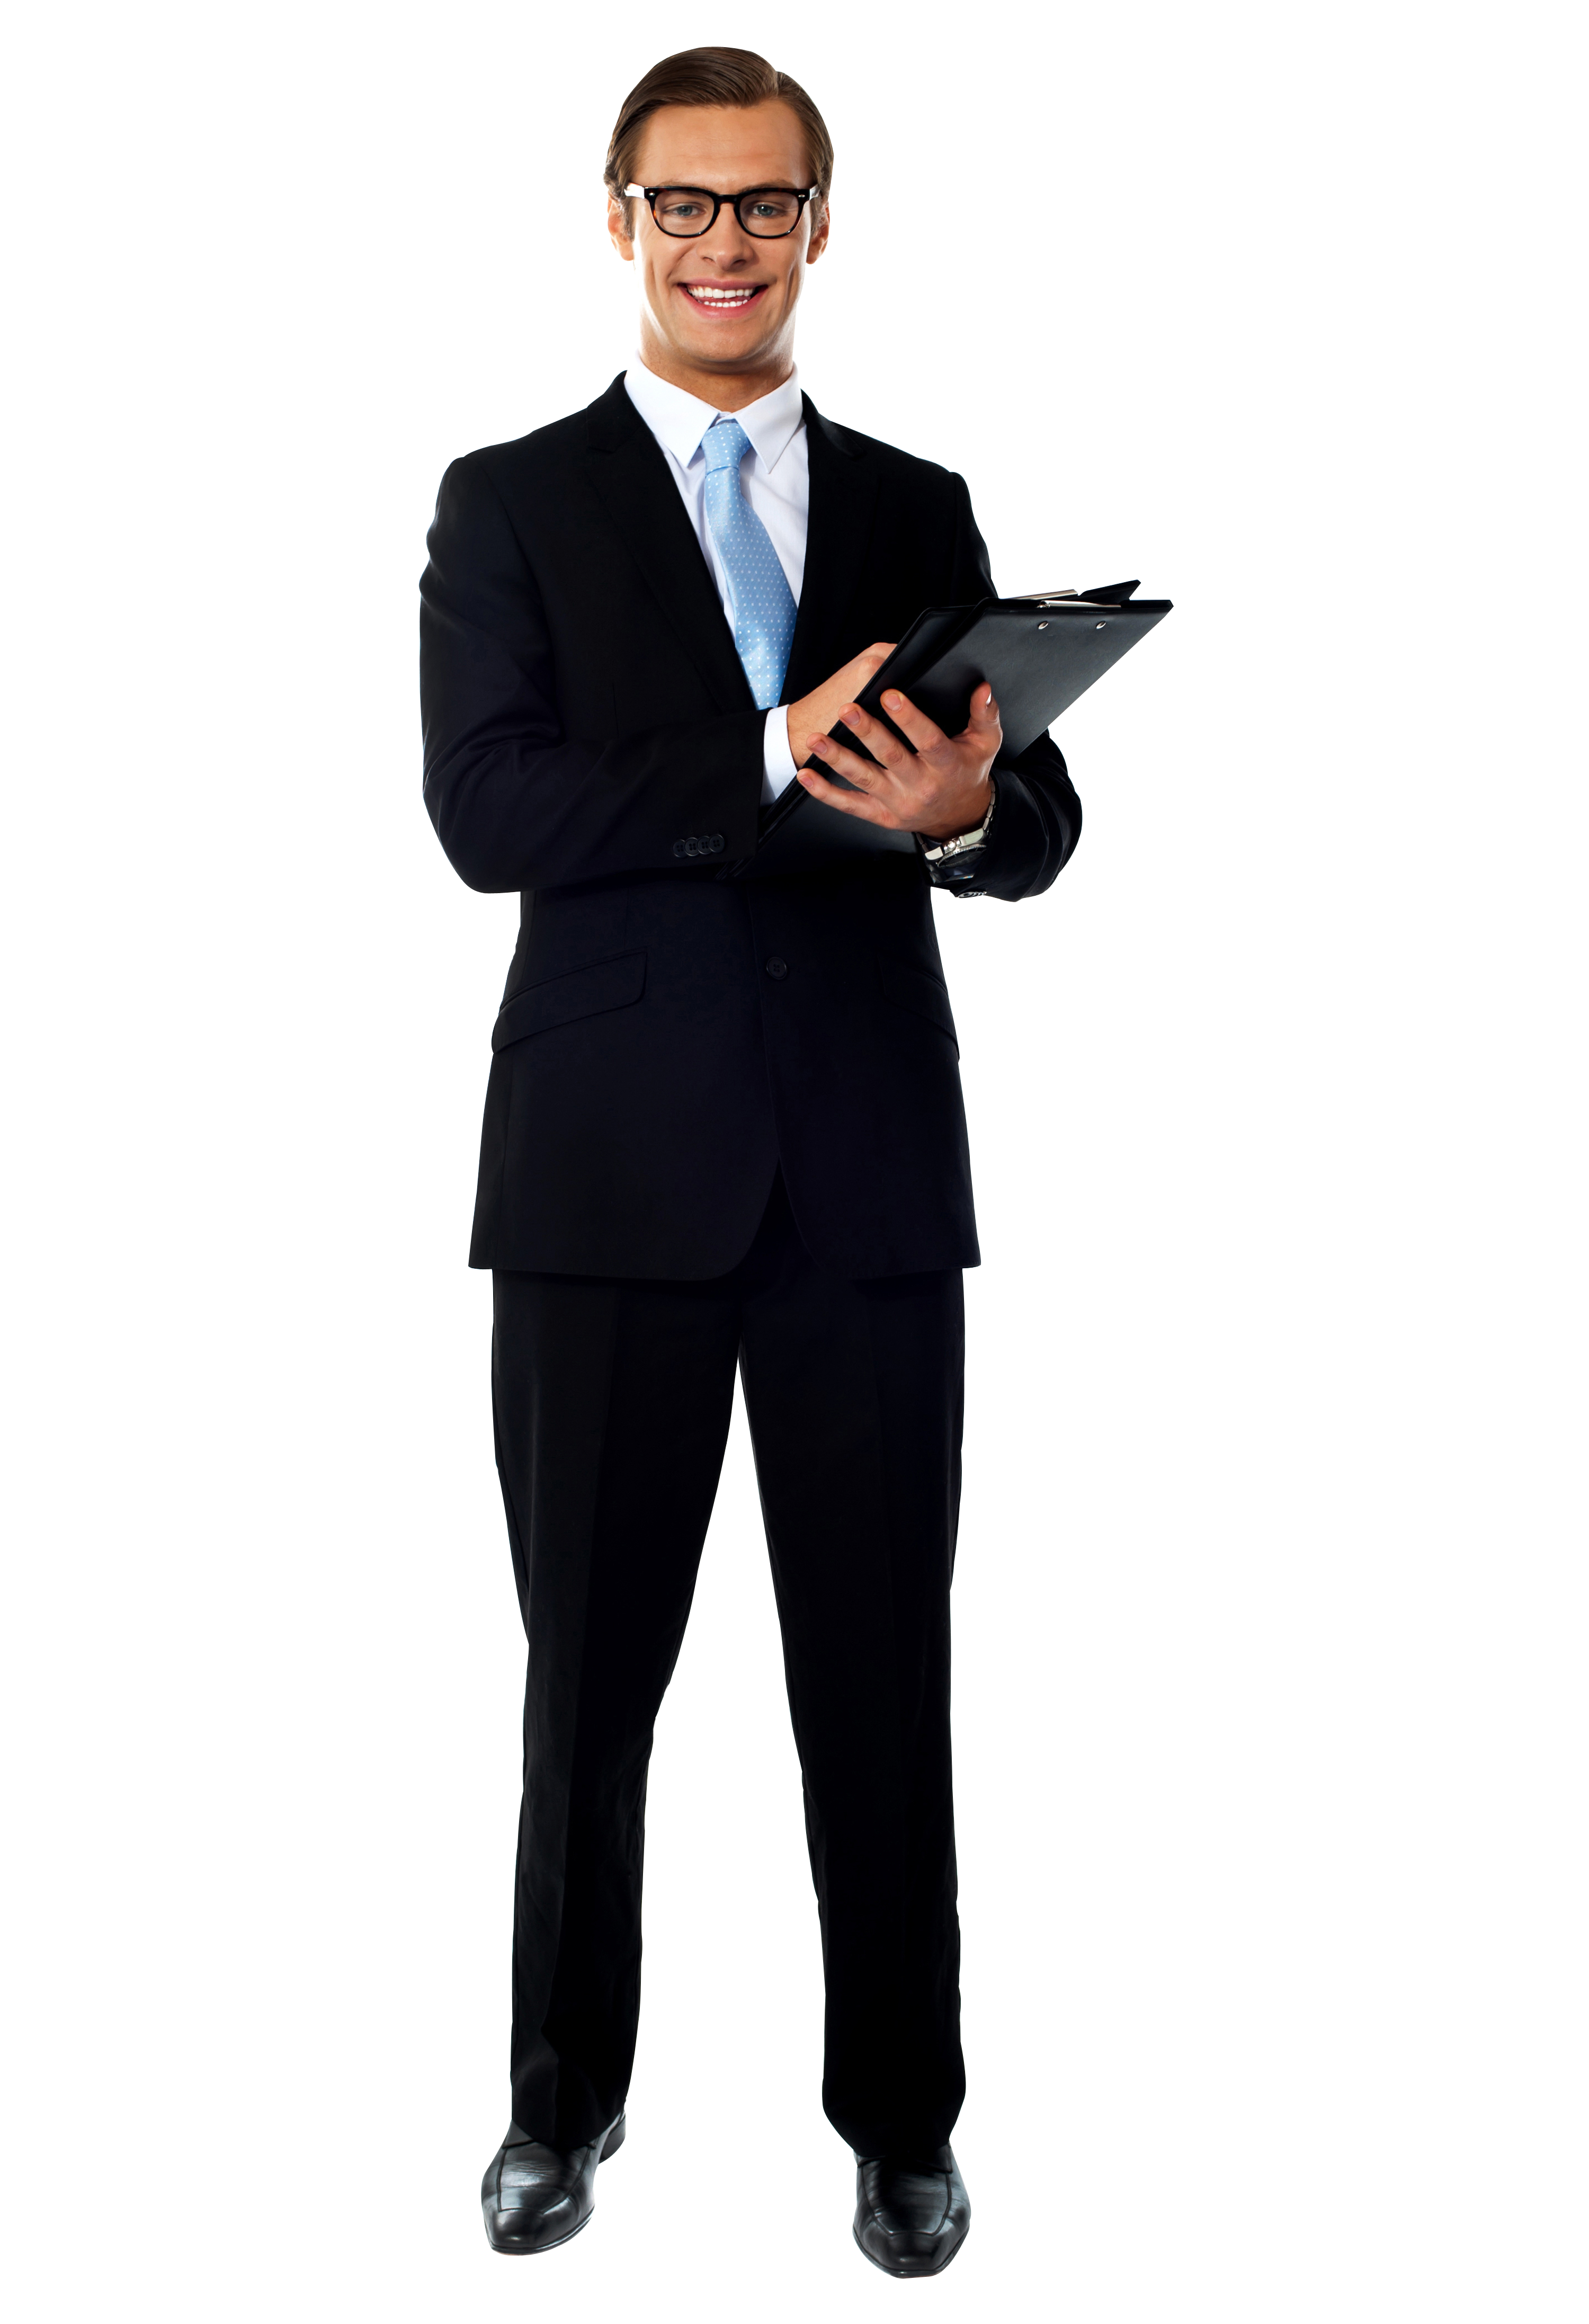 Men In Suit PNG Image